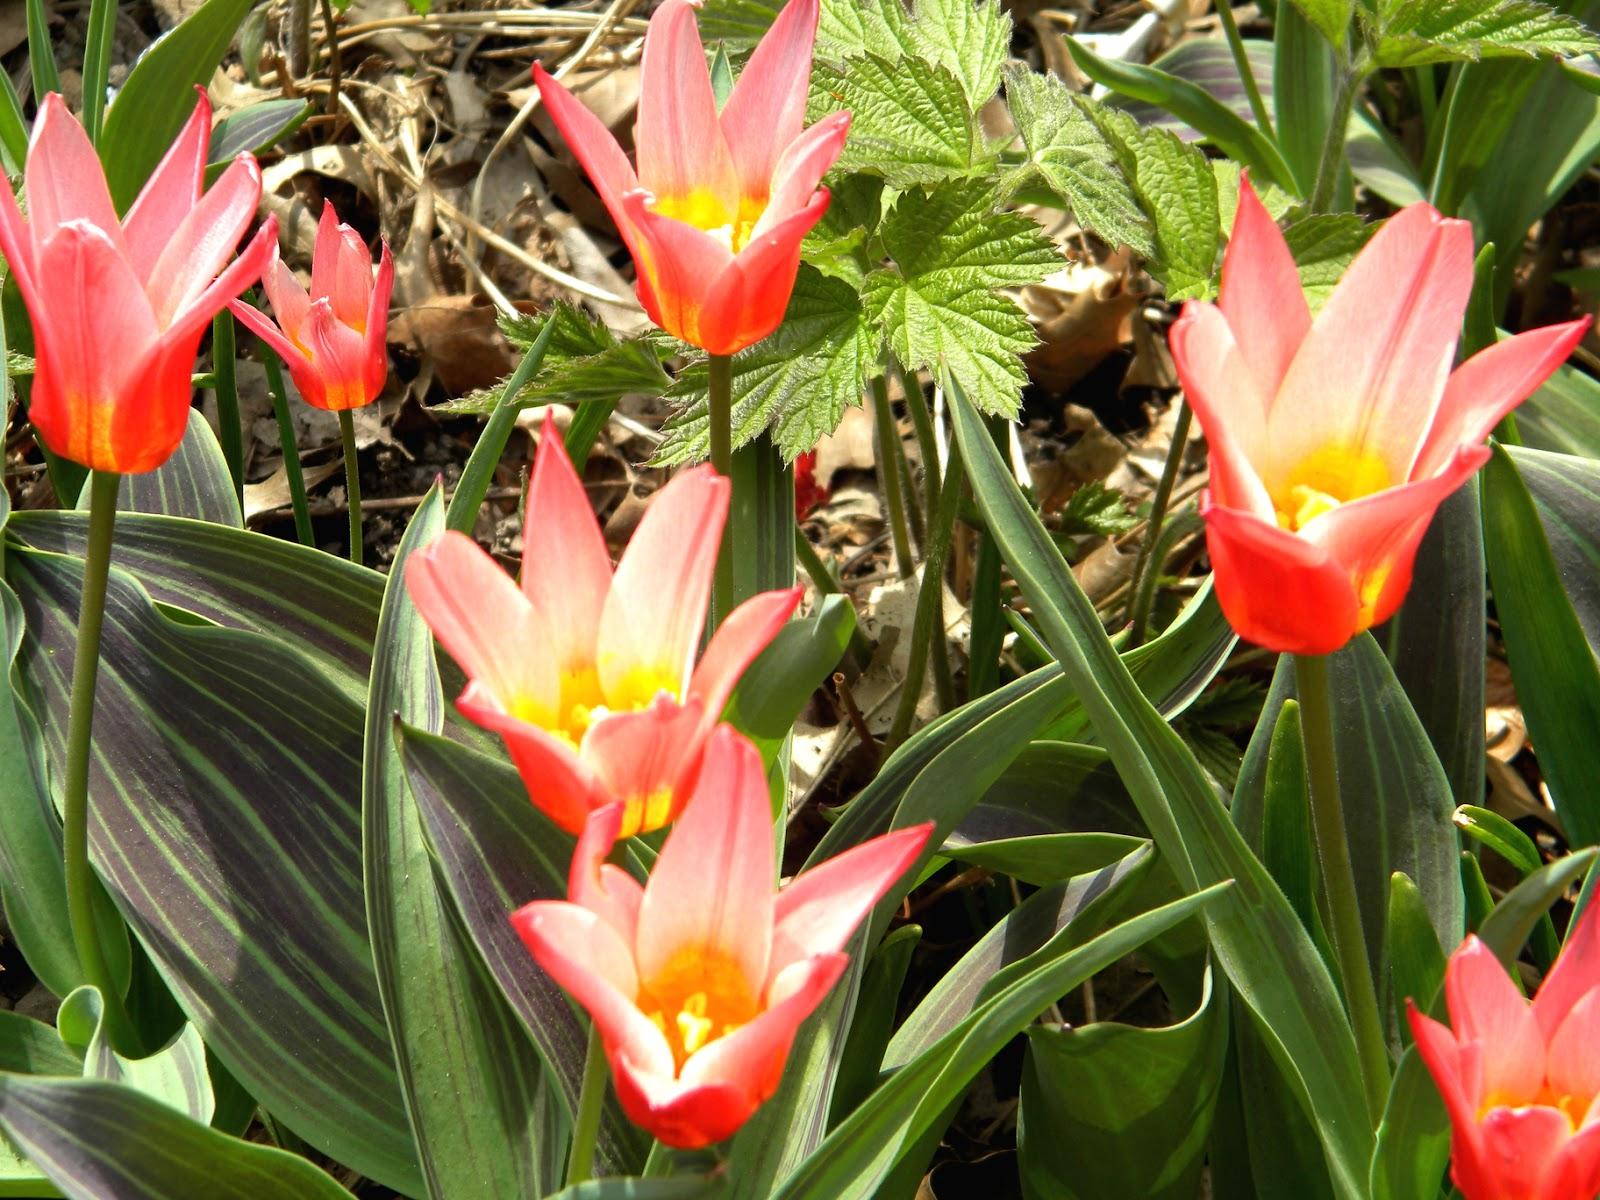 Red Tulips Strawberry Fields